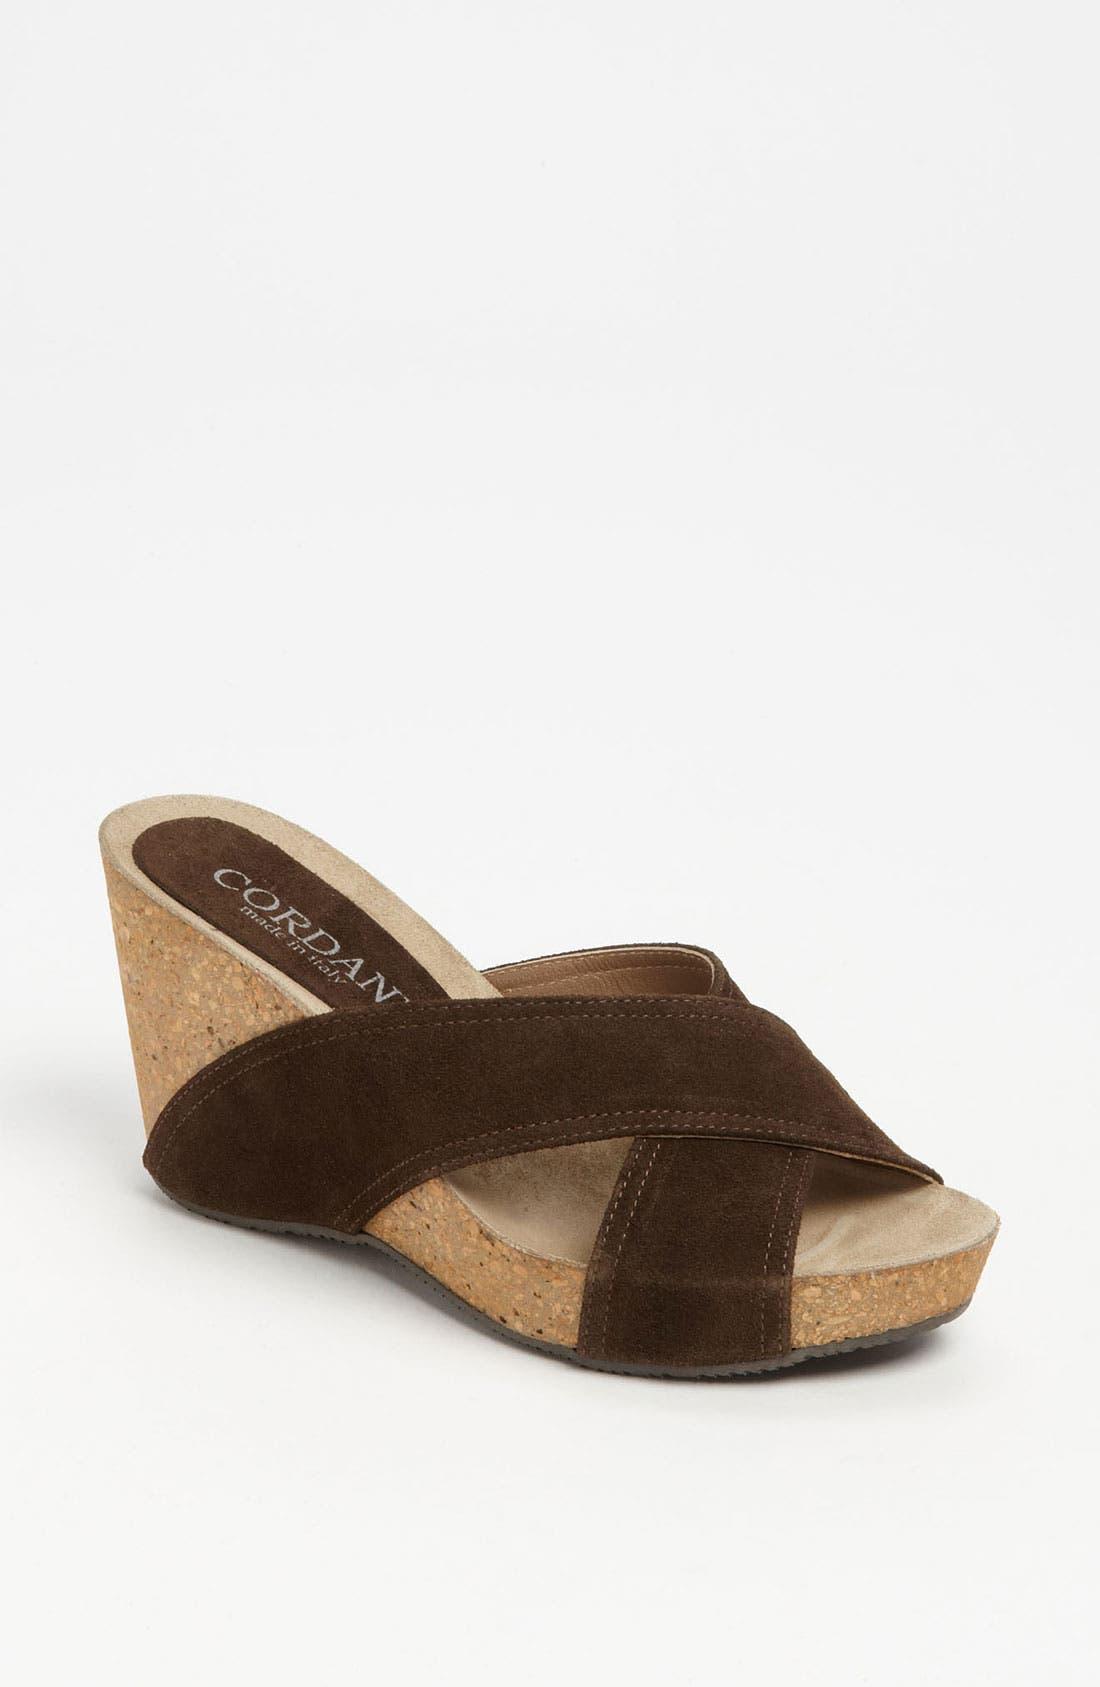 Alternate Image 1 Selected - Cordani 'Adriana' Sandal